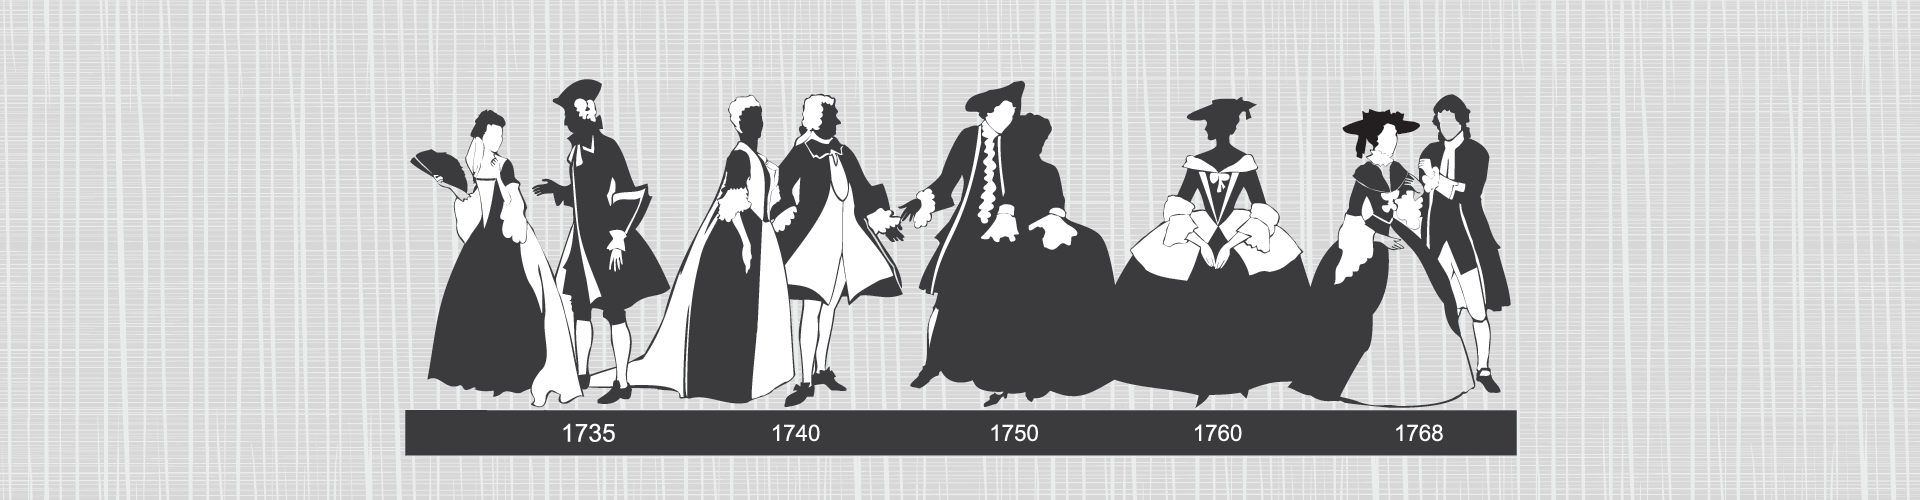 1735 to 1768